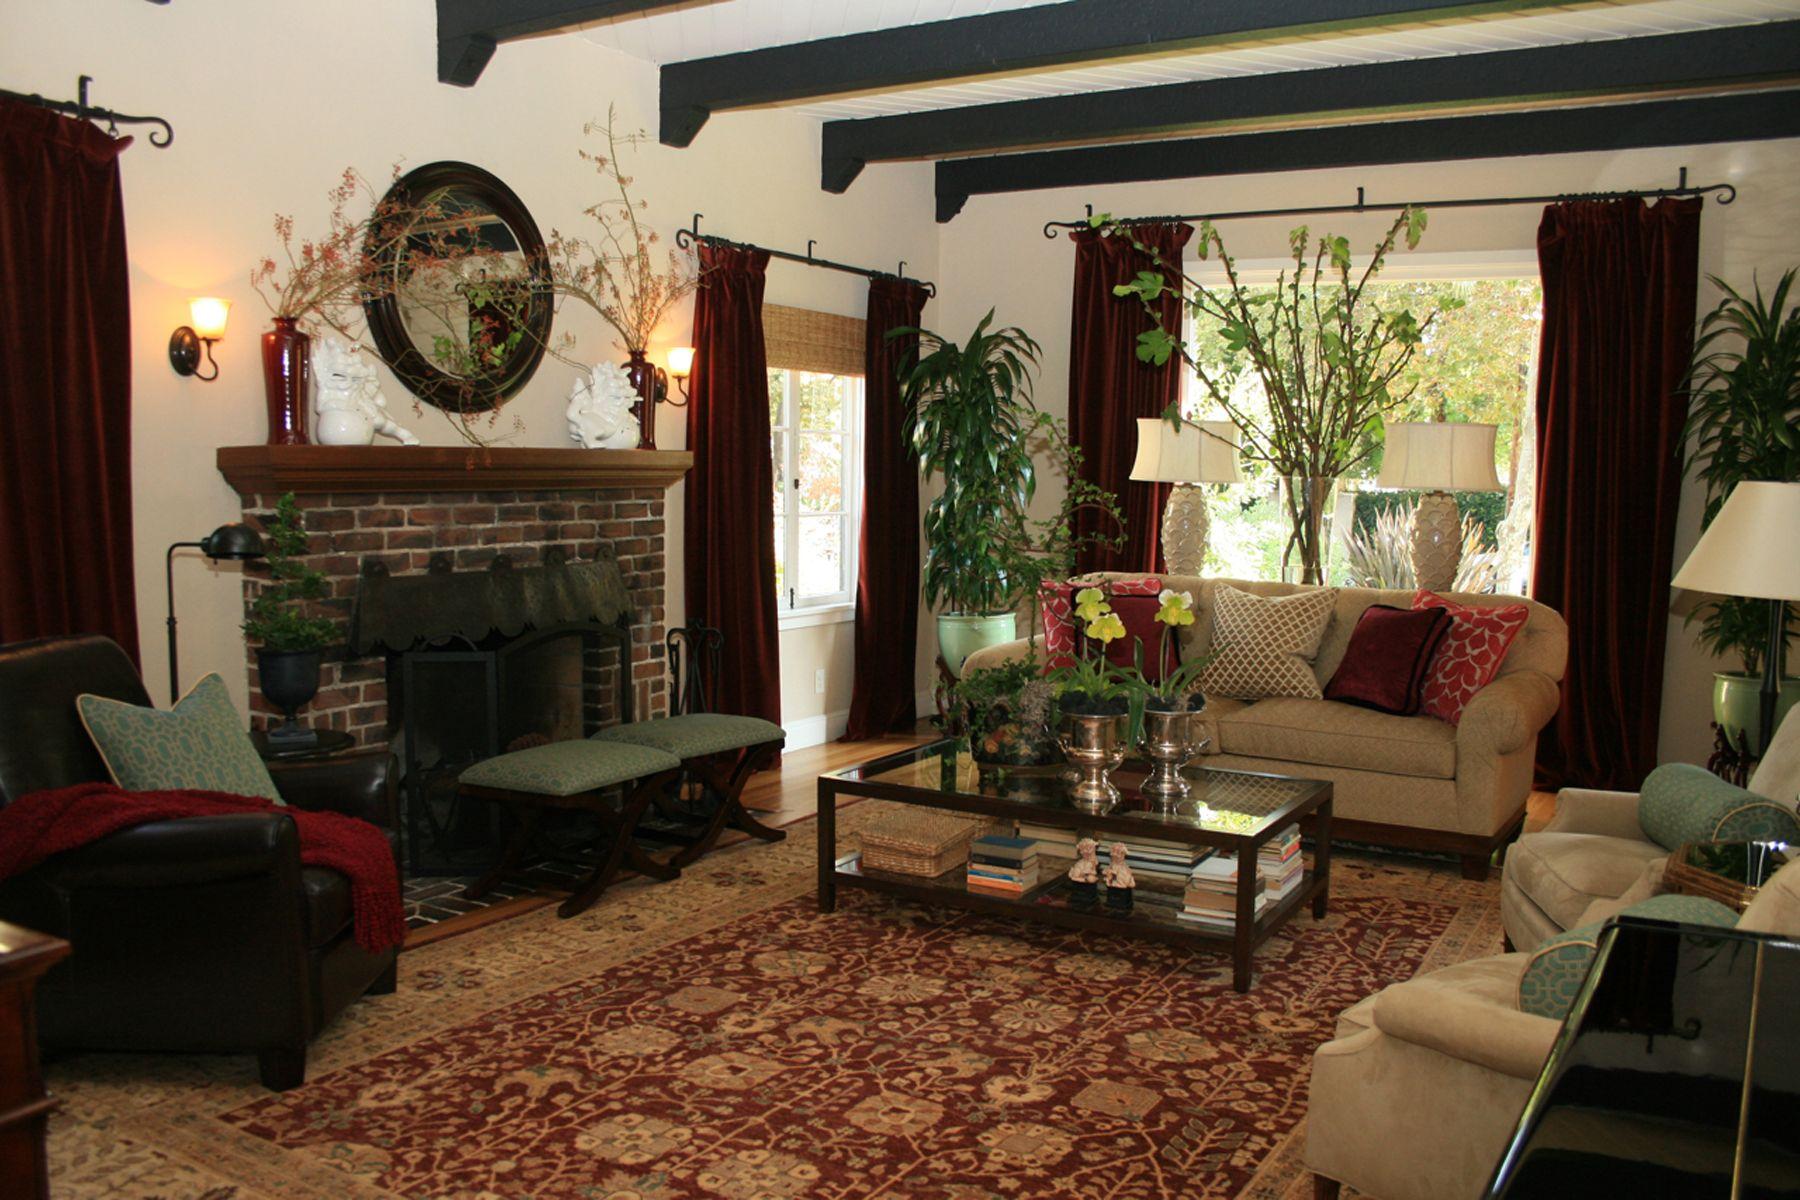 Living Room Spanish Style Design Spanish Living Room Spanish Living Room Design Spanish Style Decor